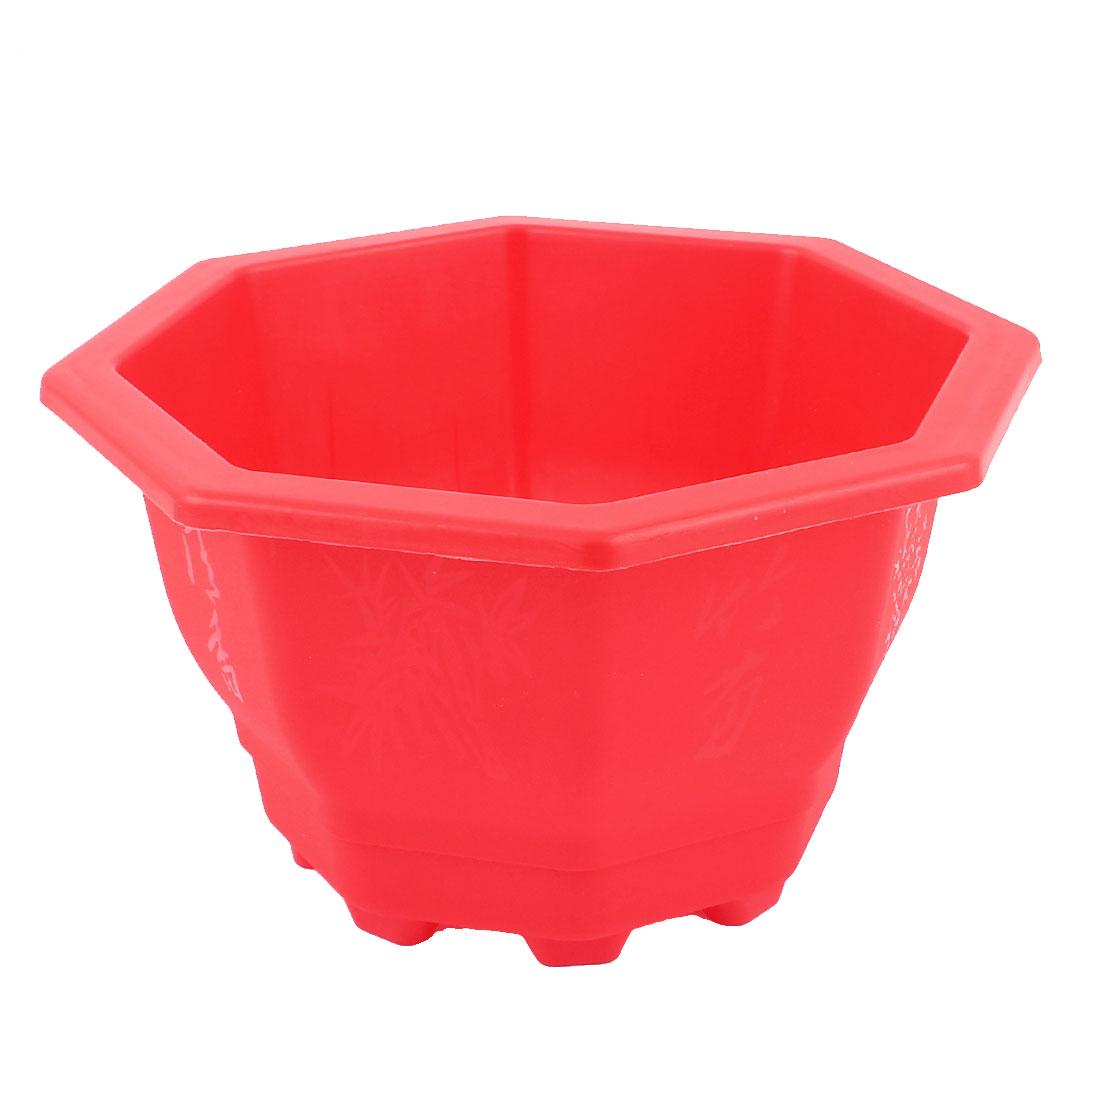 Red Plastic Octagon Design Garden Planter Plant Flower Pot Flowerpot